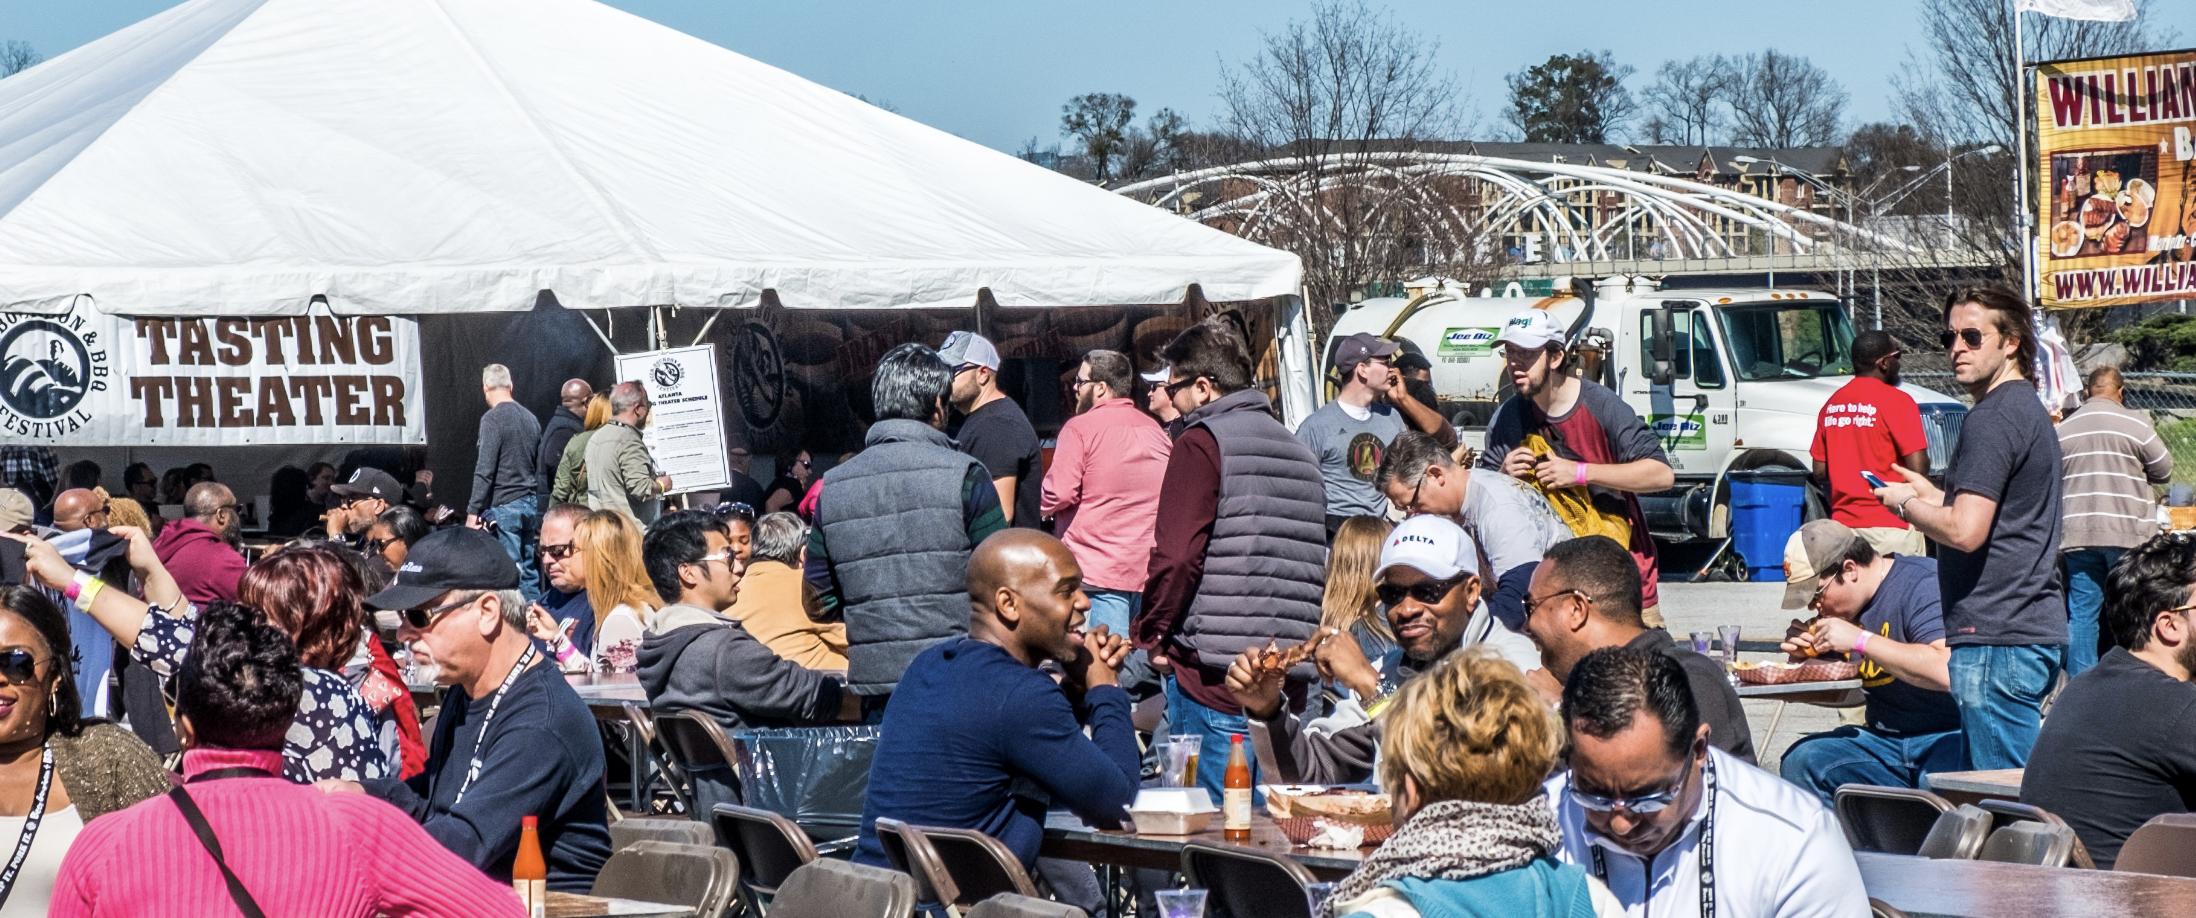 10 best bets for Atlanta late-winter festivals, gatherings